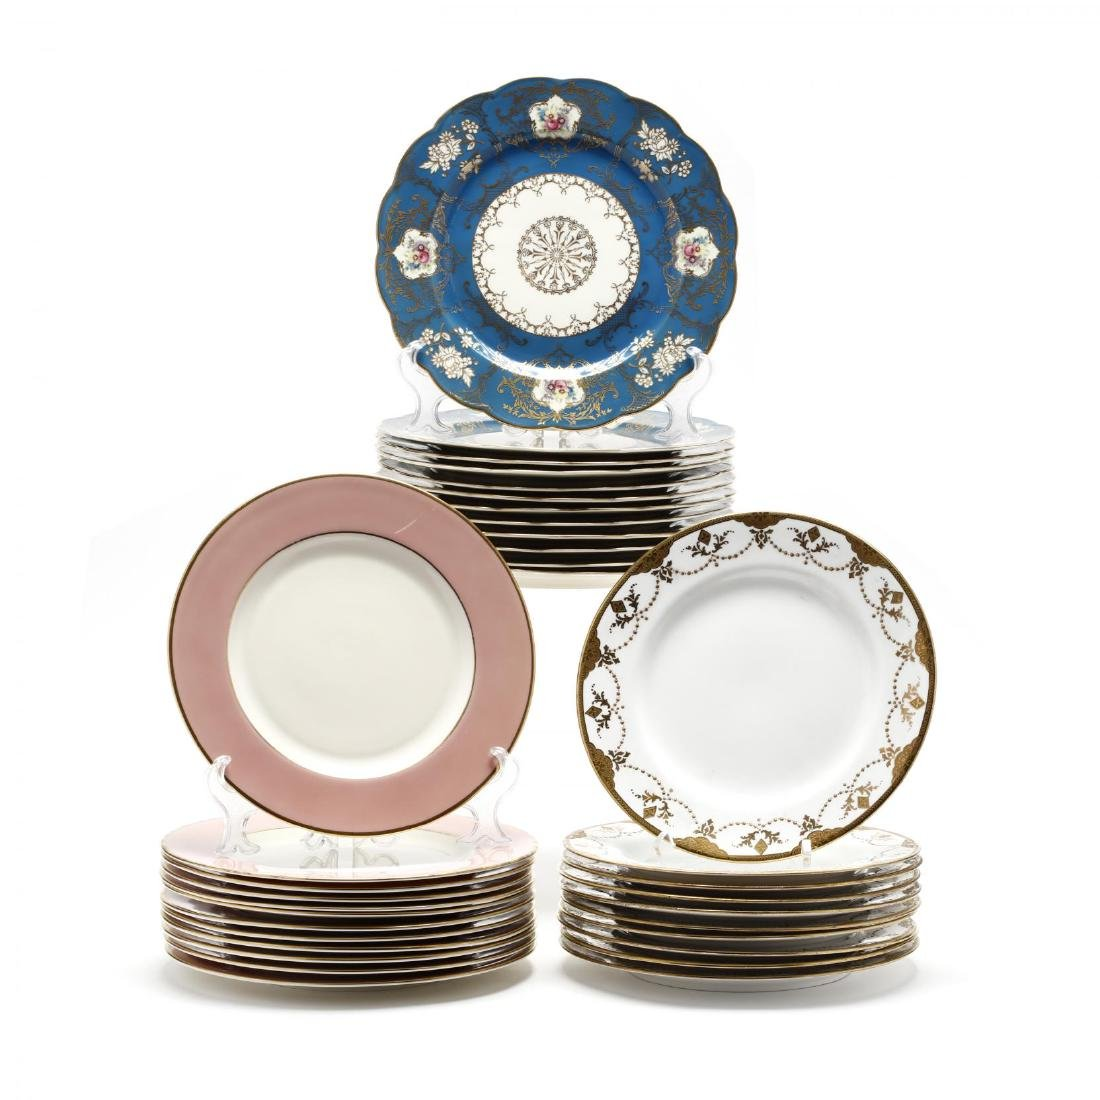 Three Sets of Buffet Plates